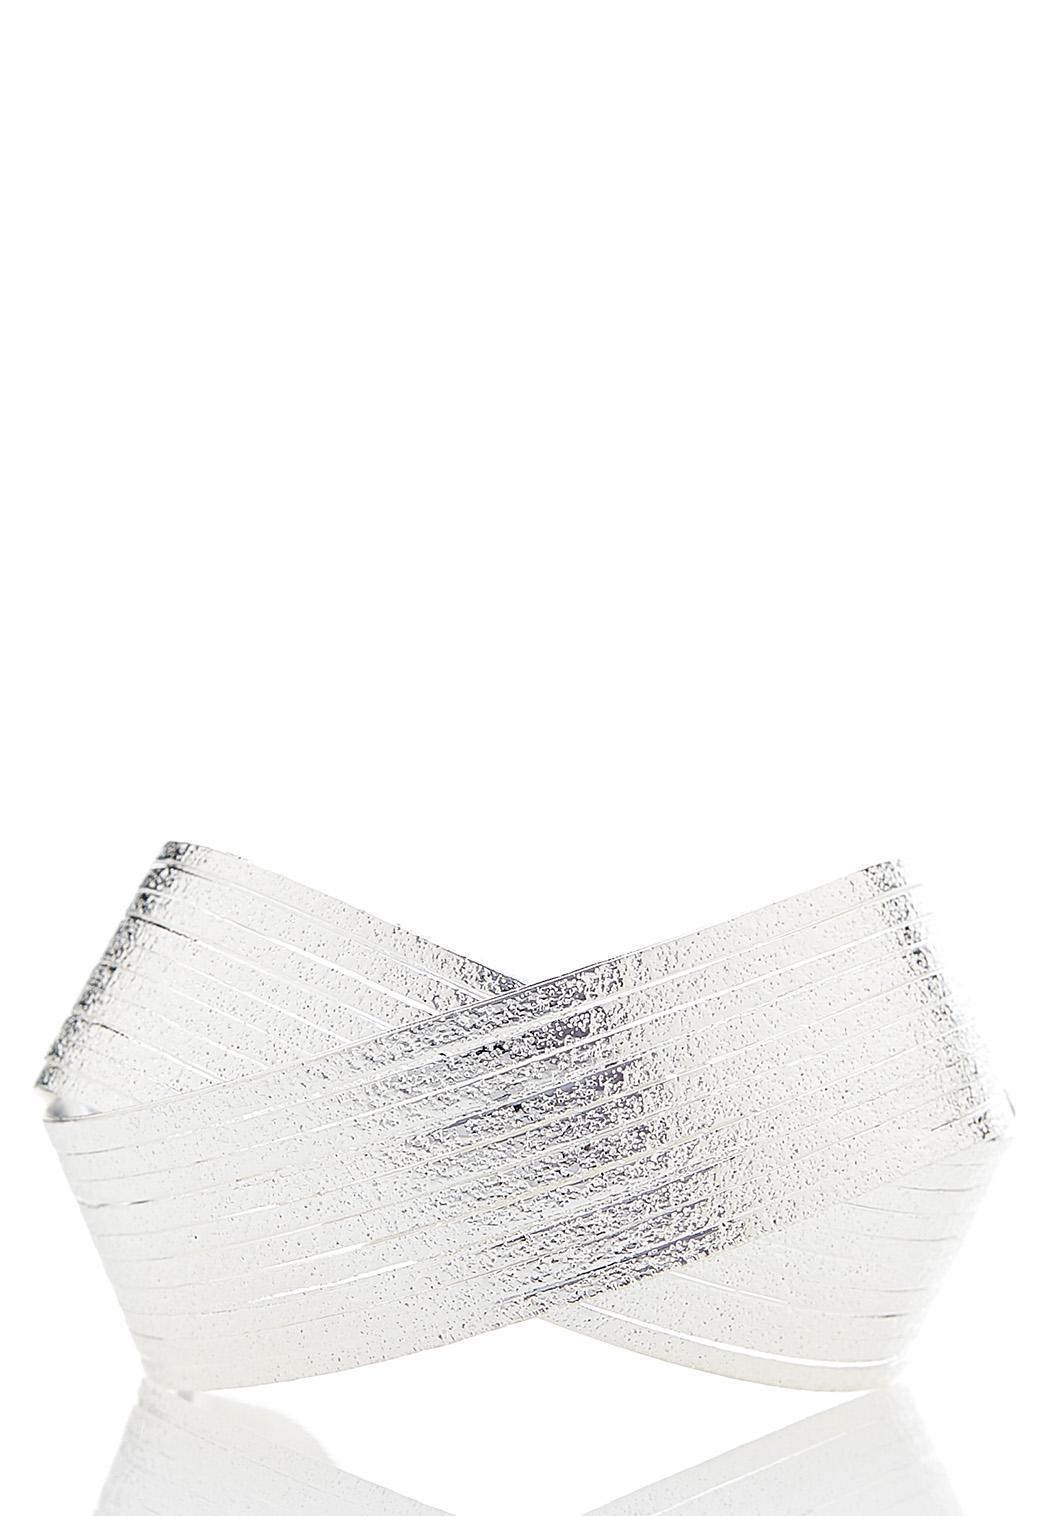 Silver Statement Cuff Bracelet